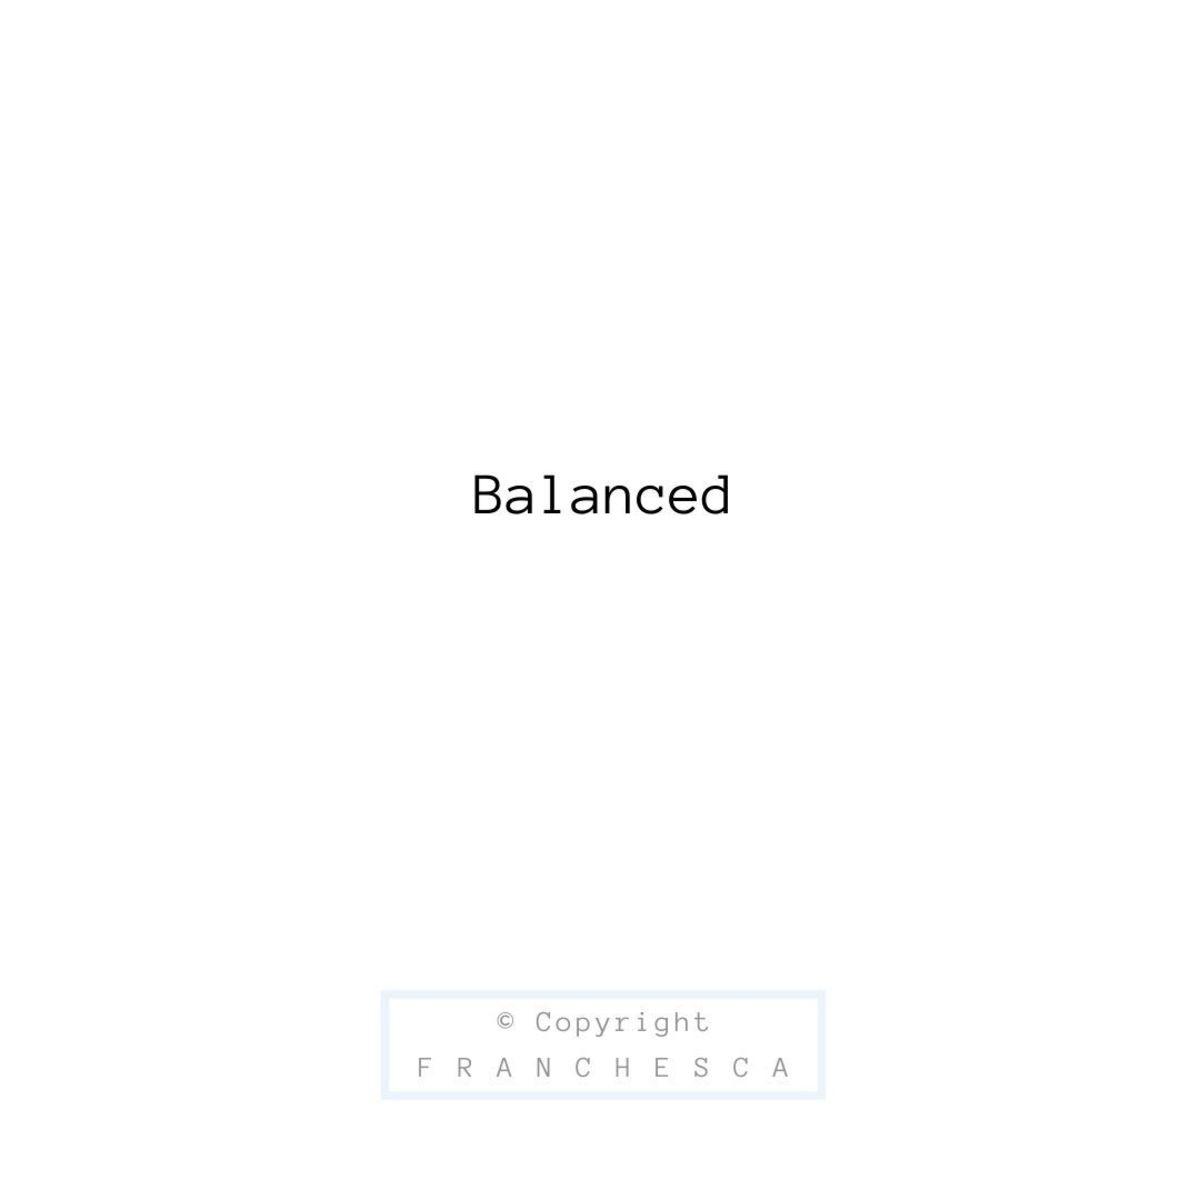 160th Article: Balanced